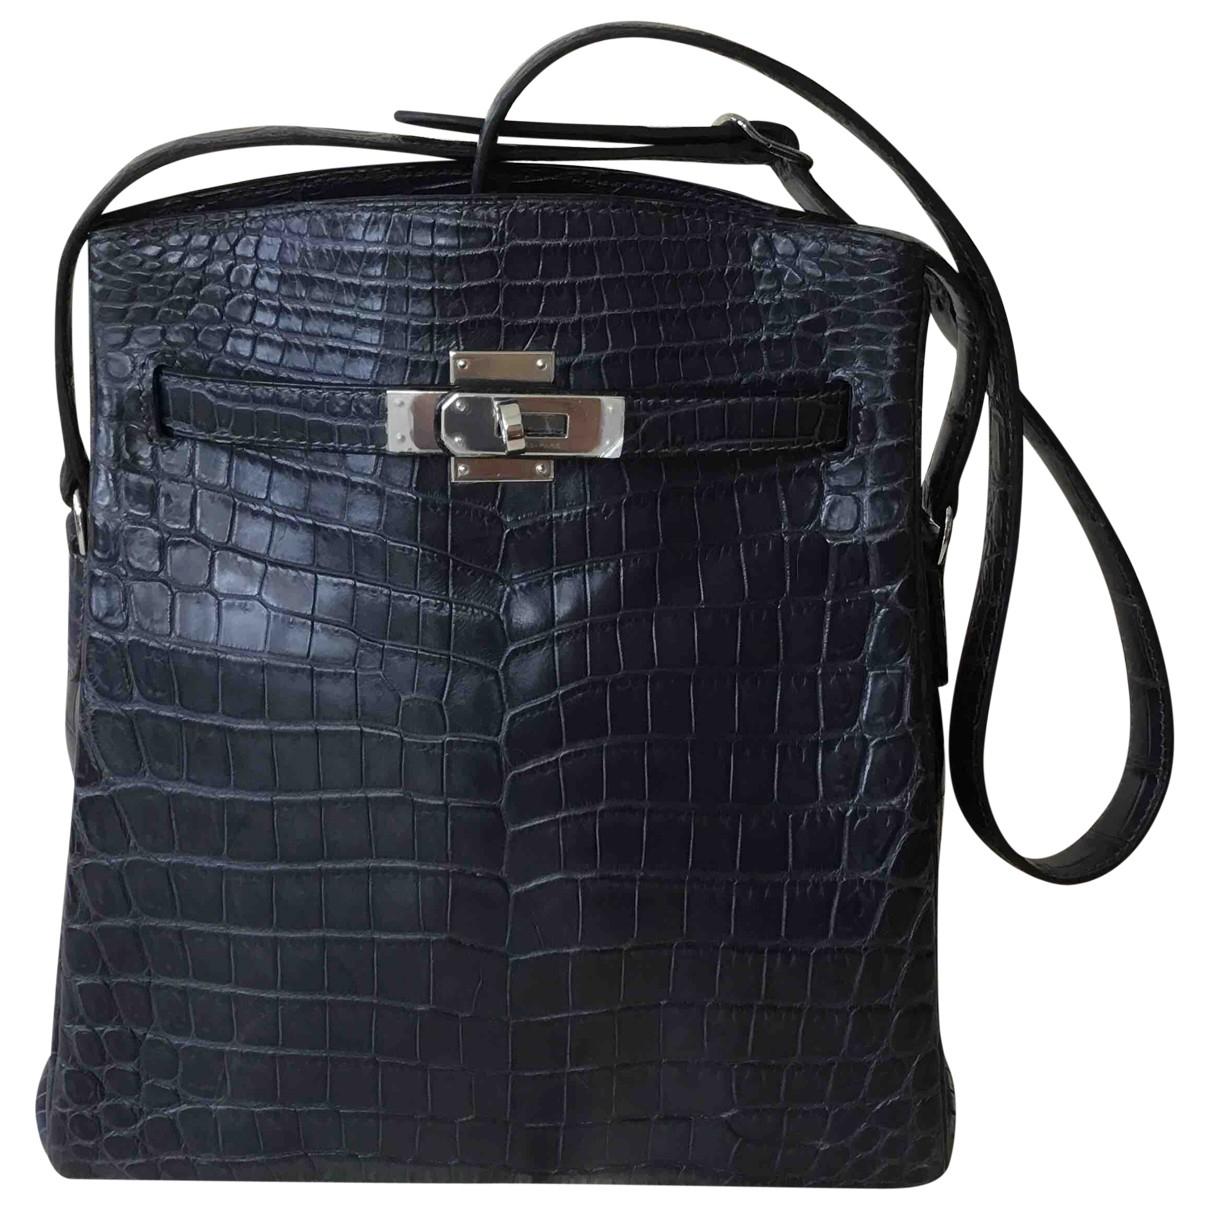 Hermes Kelly Sport Handtasche in  Blau Krokodil